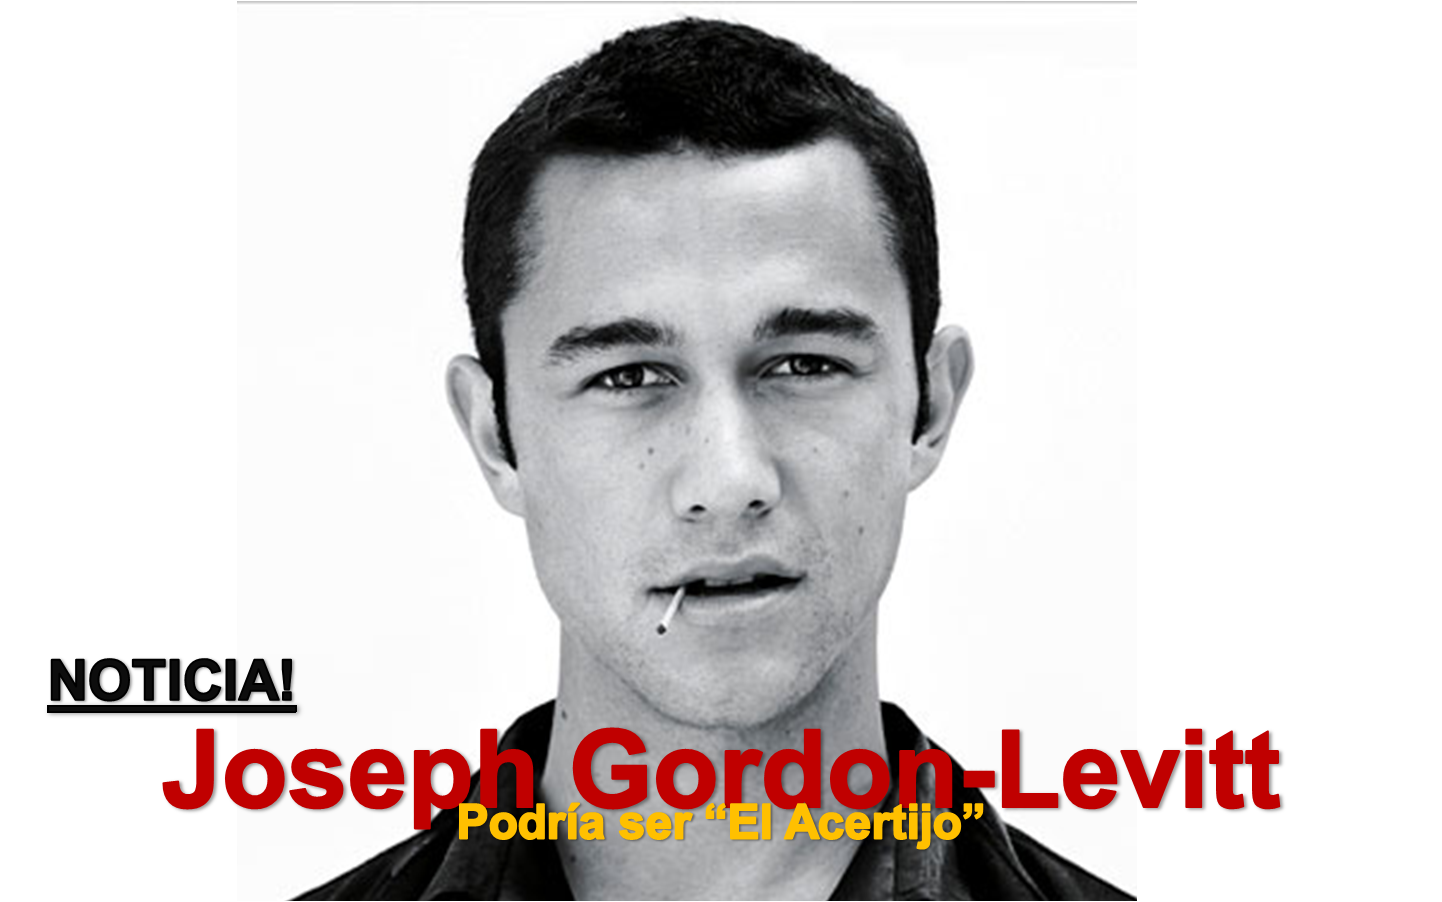 http://4.bp.blogspot.com/_dbXAbF1CTso/TEfEywWHXPI/AAAAAAAAAfE/5thSfuDNRsI/s1600/Joseph+Gordon+Levitt.png